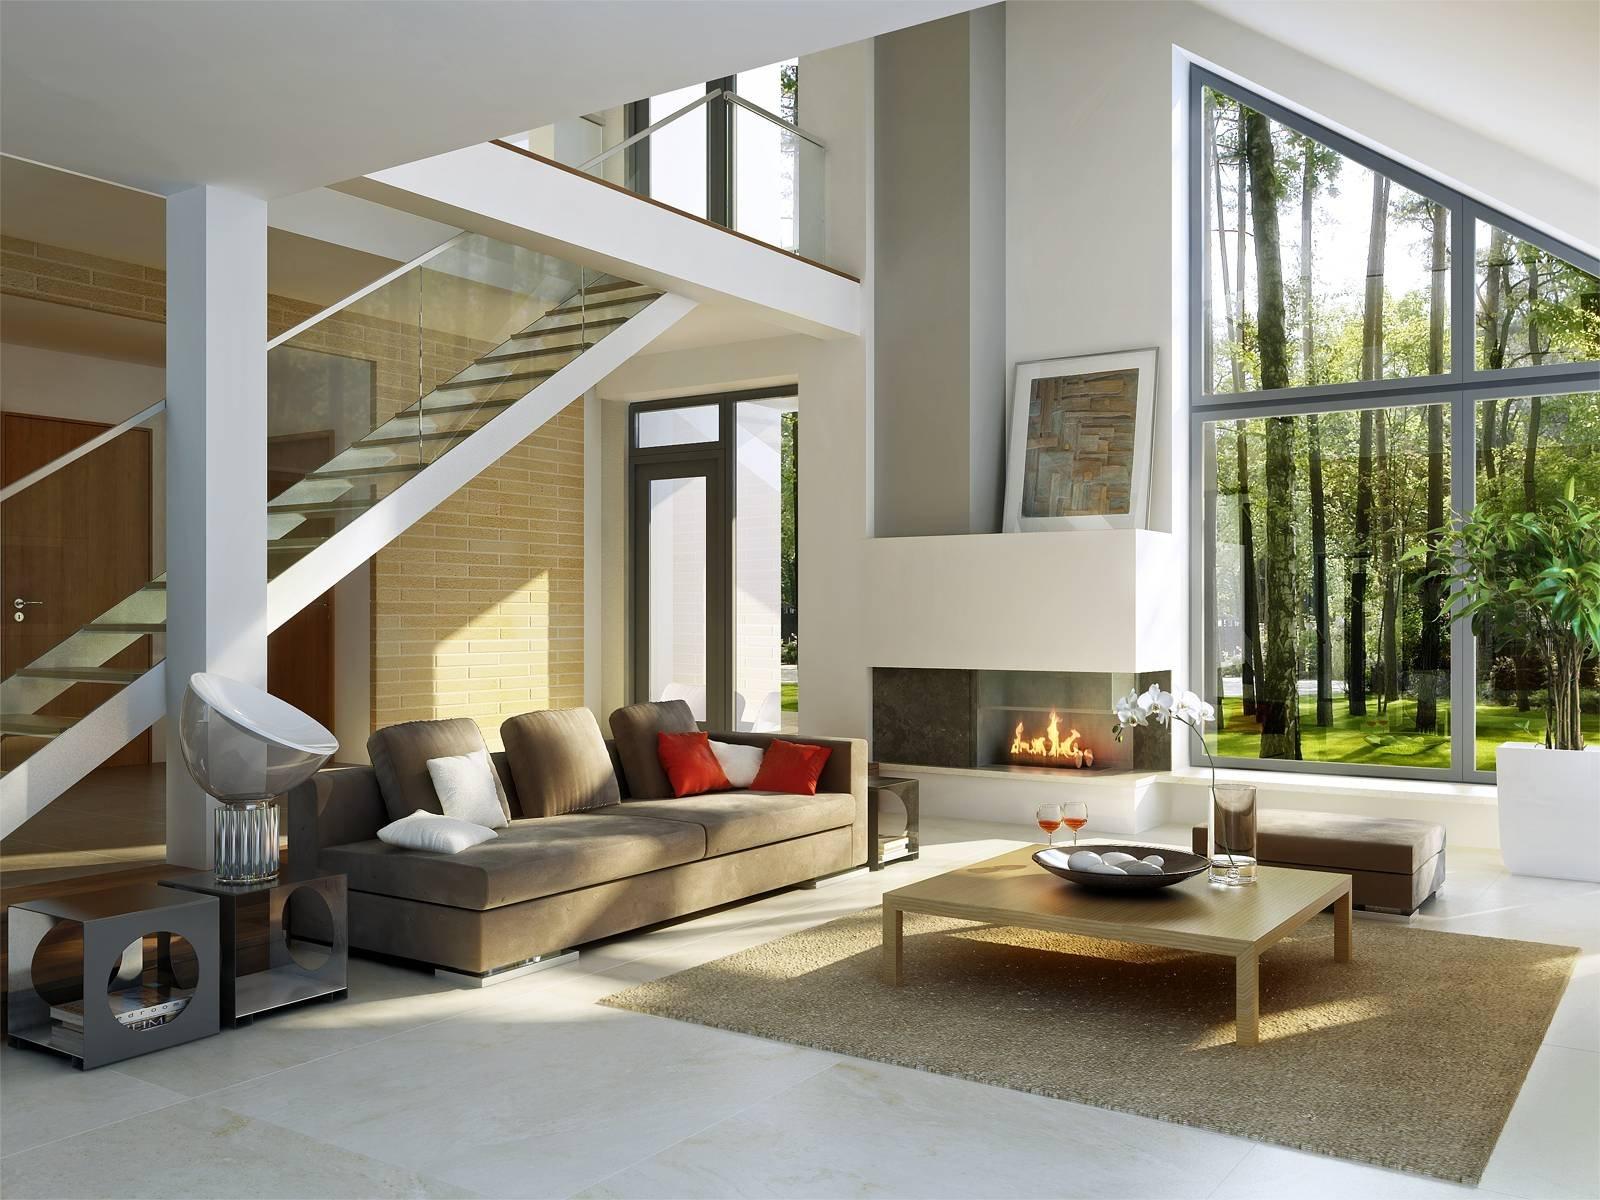 Интерьер дома в стиле хай-тек